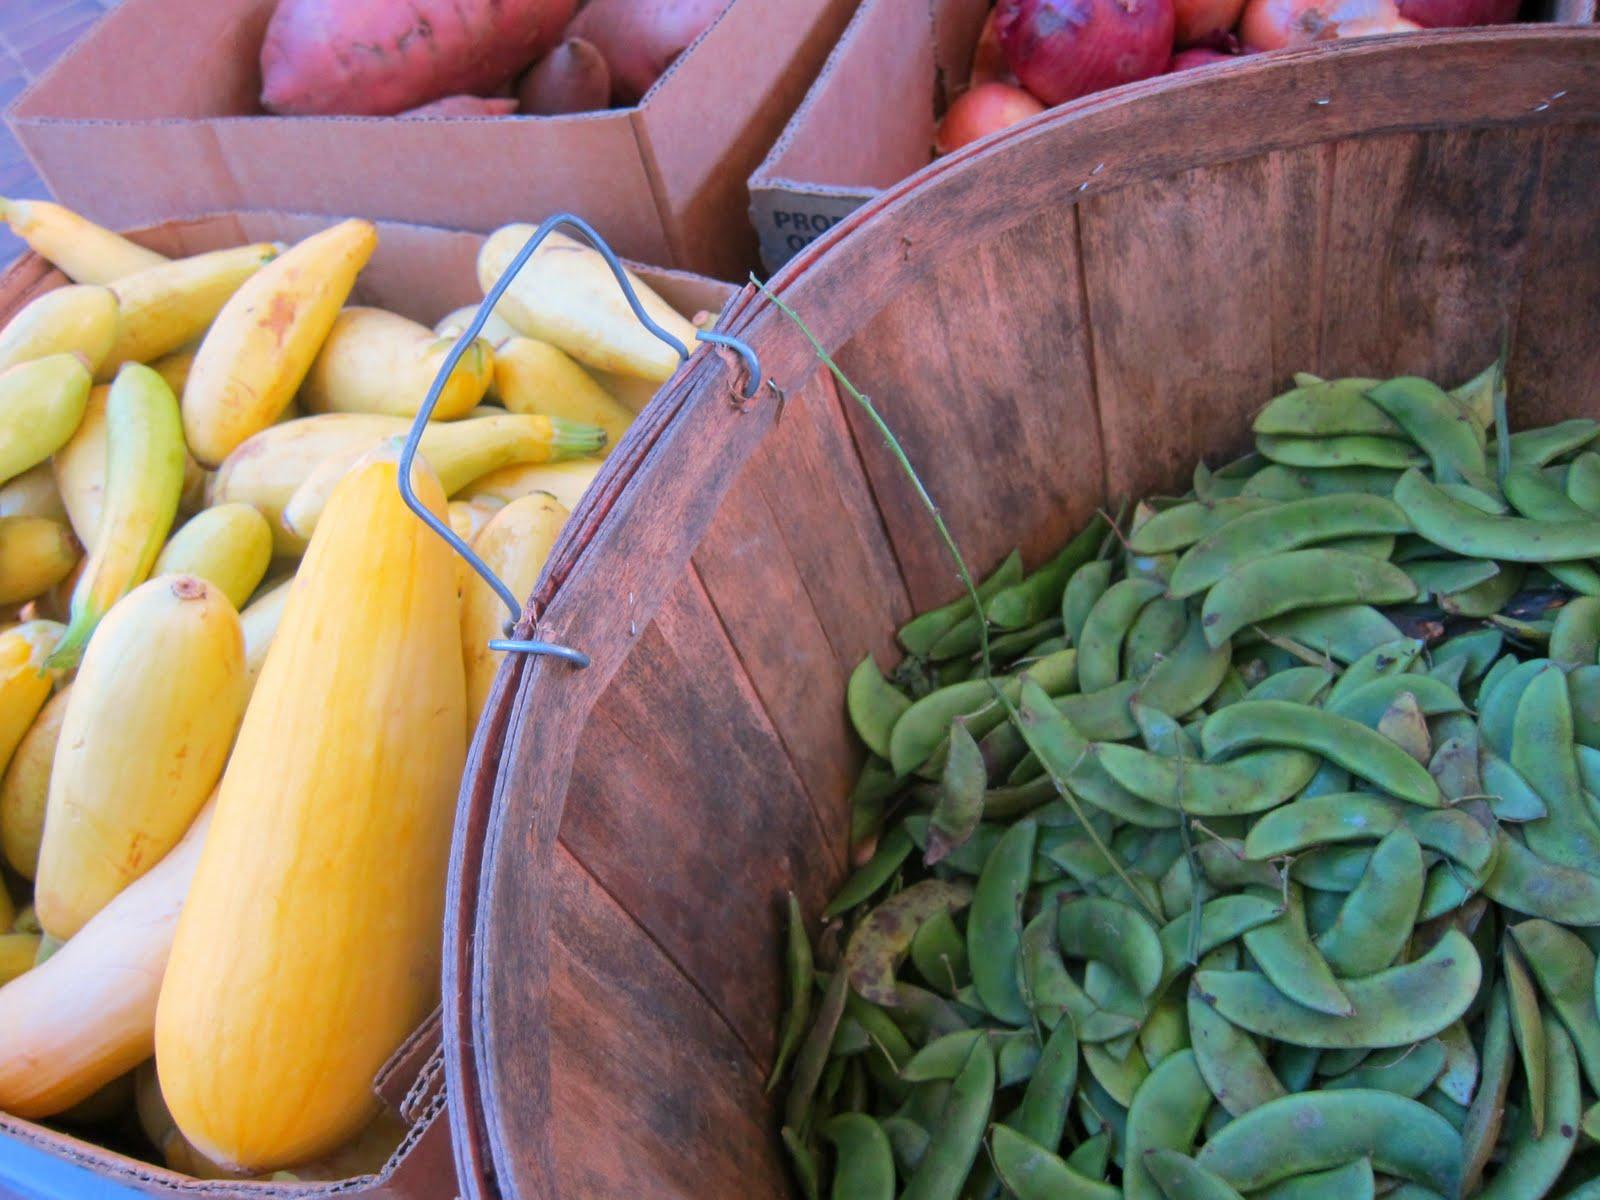 http://1.bp.blogspot.com/_iiZuzAo-0RA/TIVKGKvF2WI/AAAAAAAAC-M/vAW1h_mlK8k/s1600/market+veggies.jpg